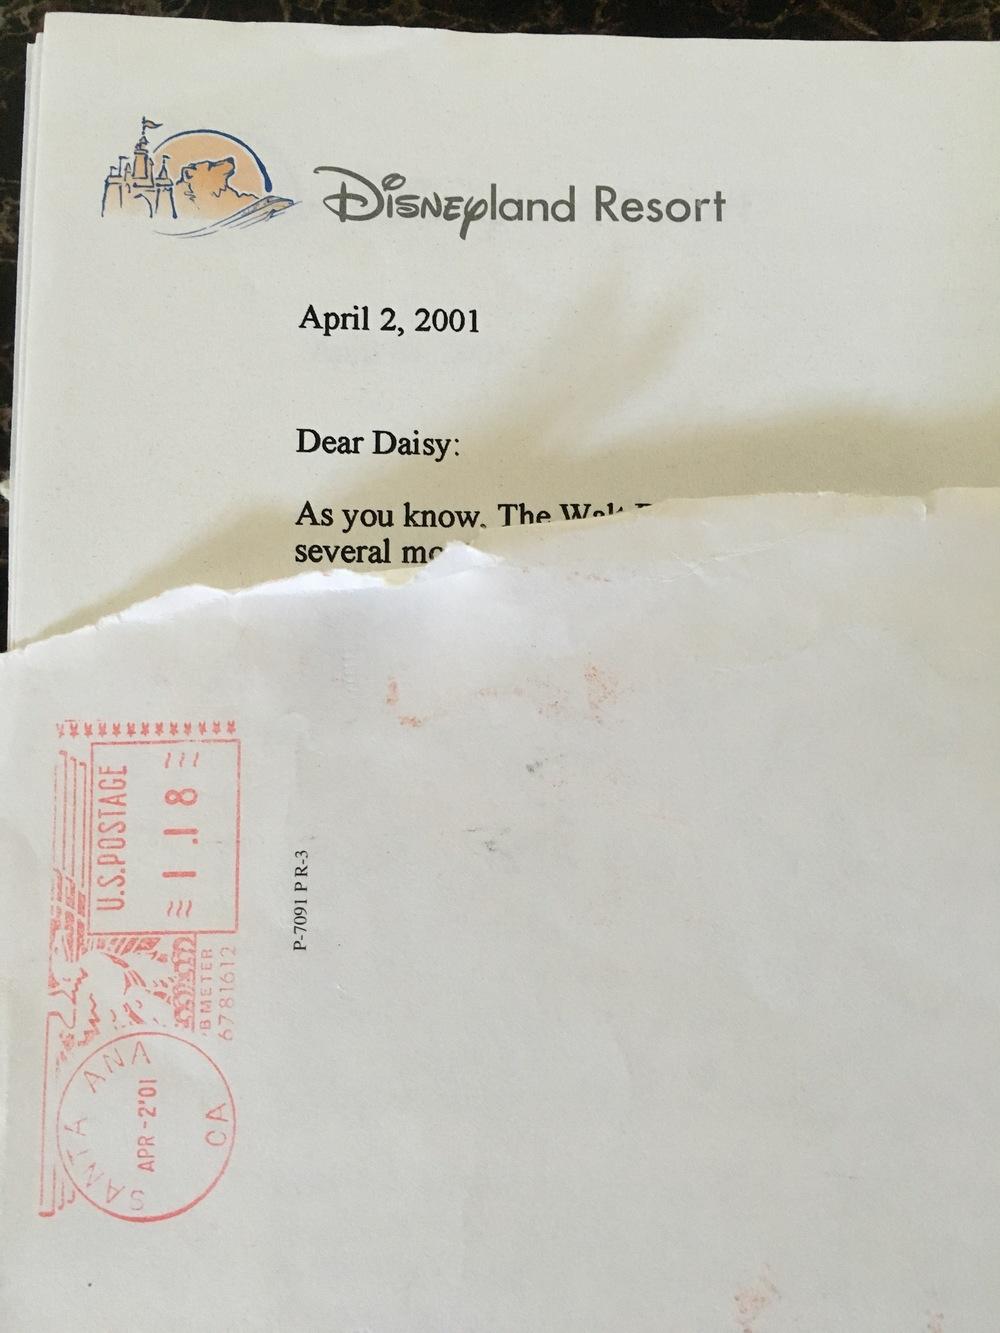 Disneyland Resort Letterhead design, 2001